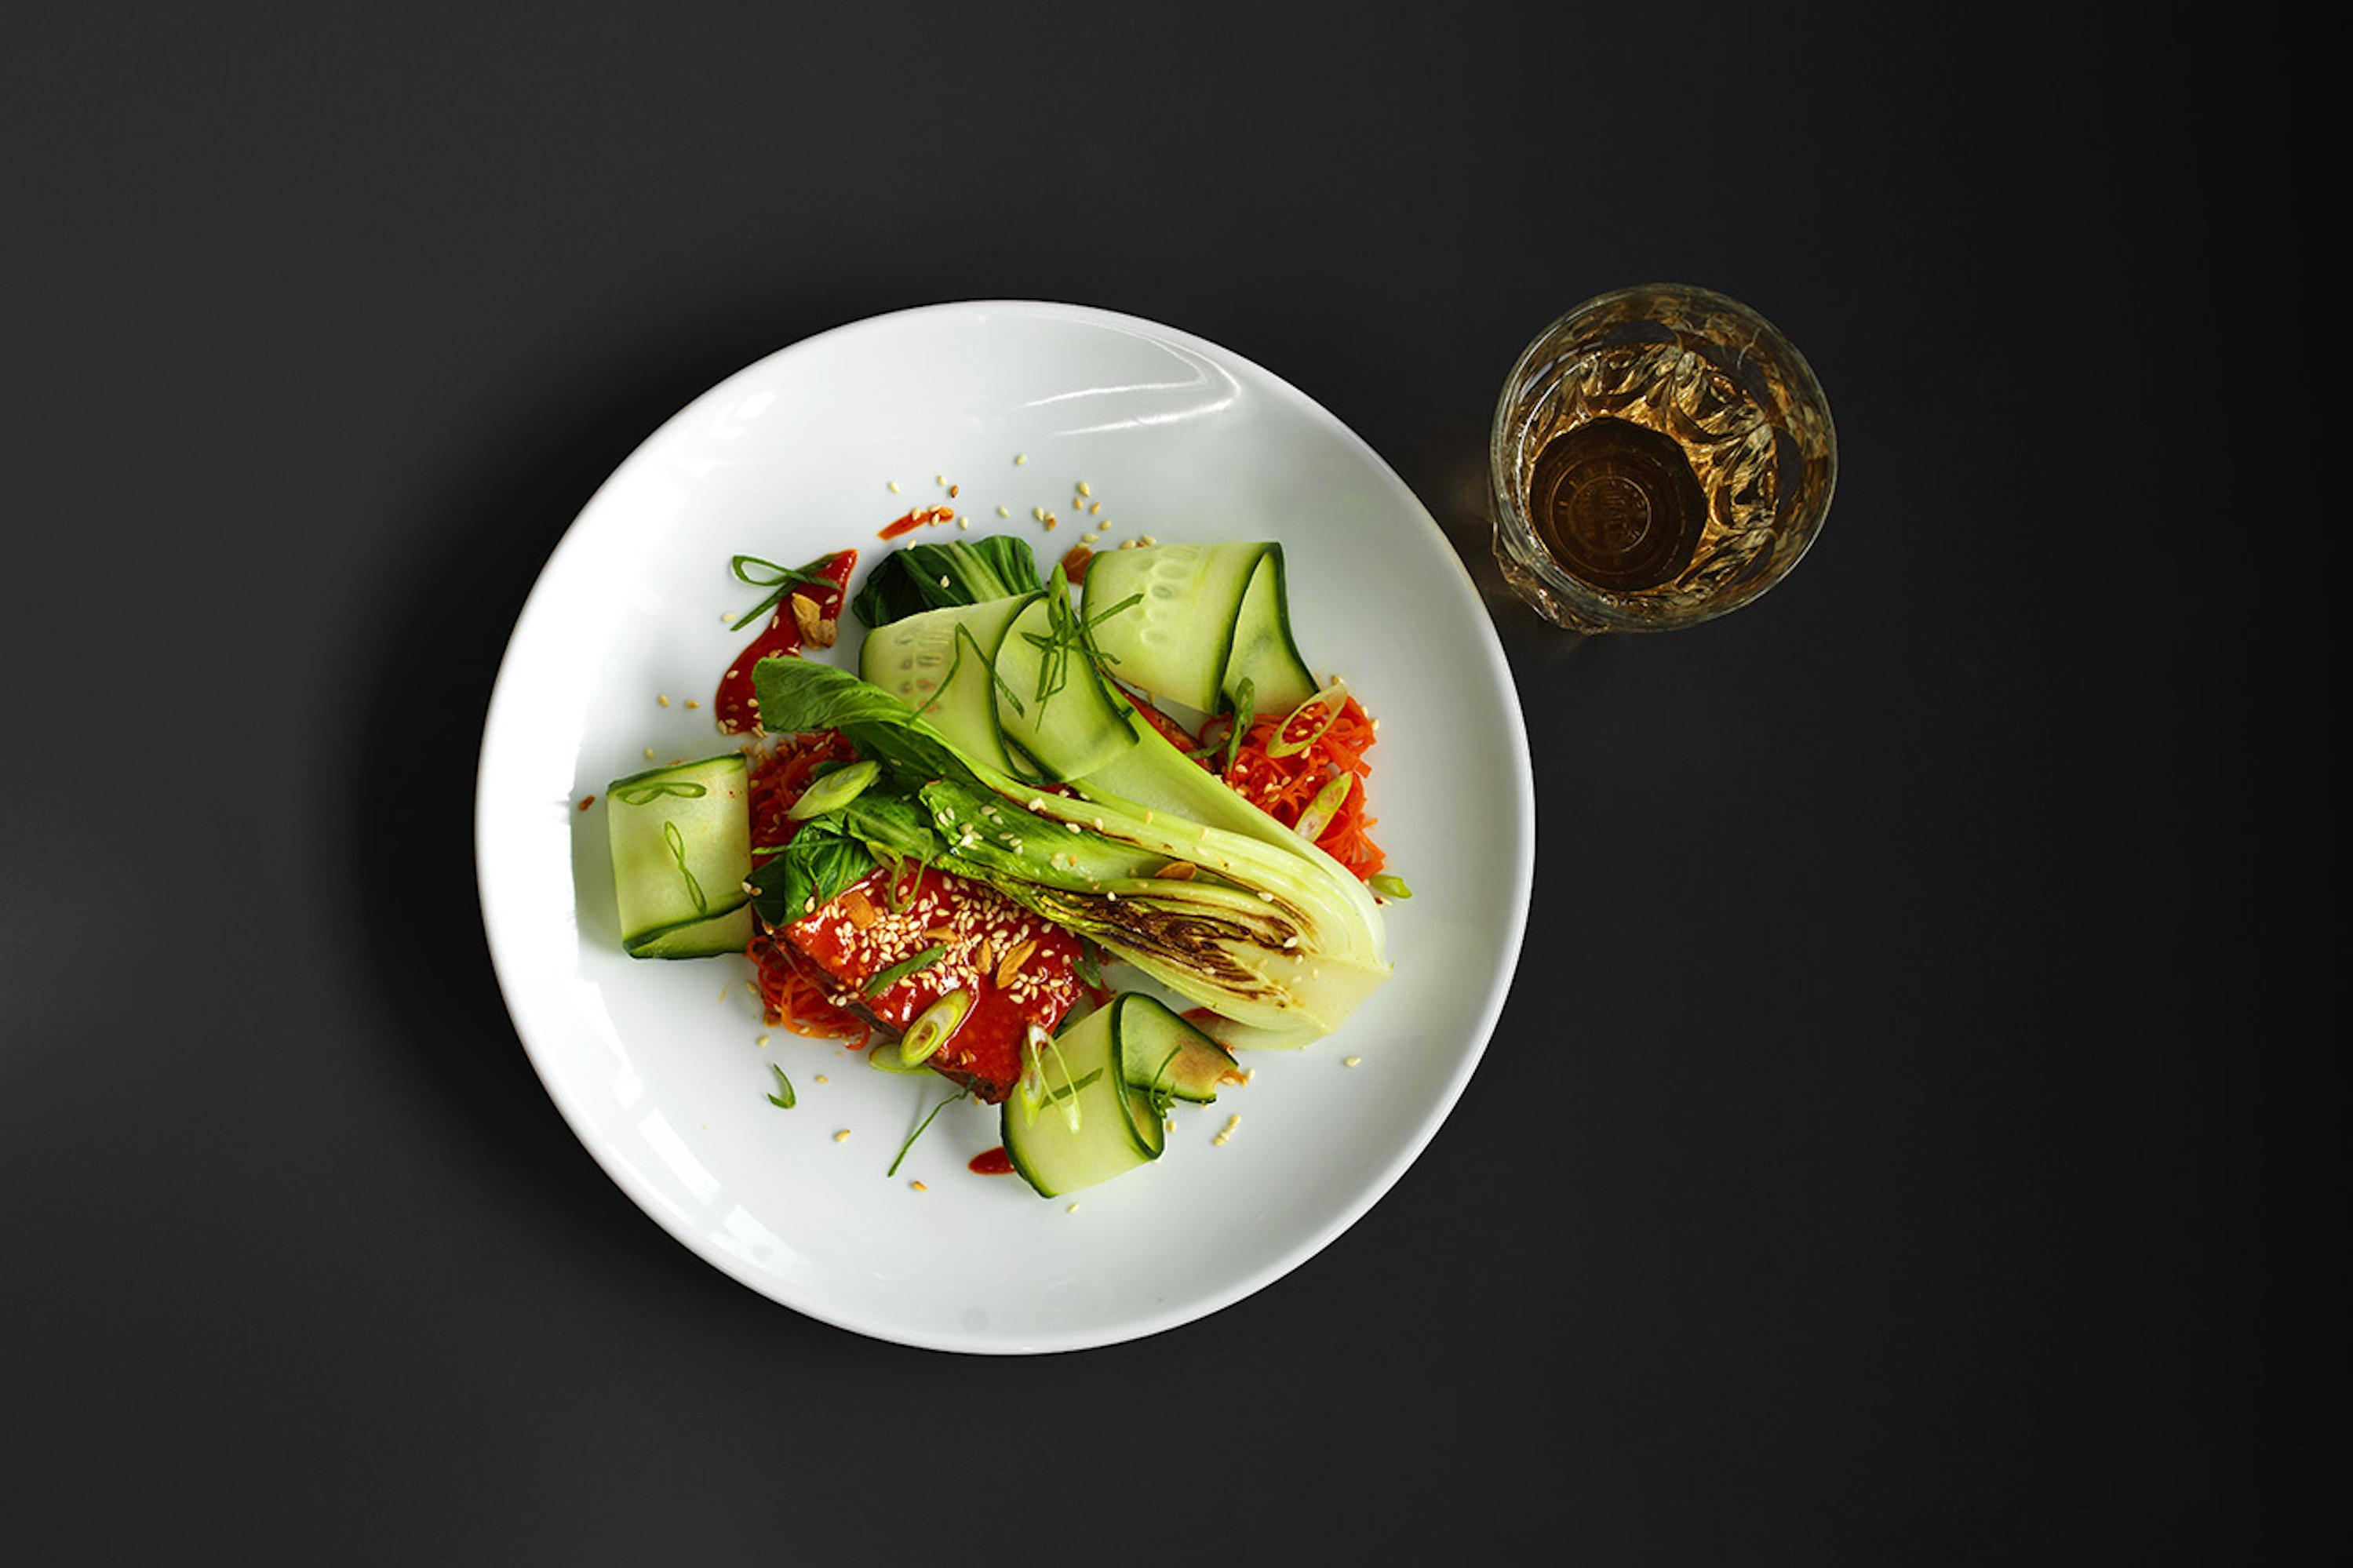 Vegetarian and vegan restaurant Wildflower will close at Peckham Levels in London